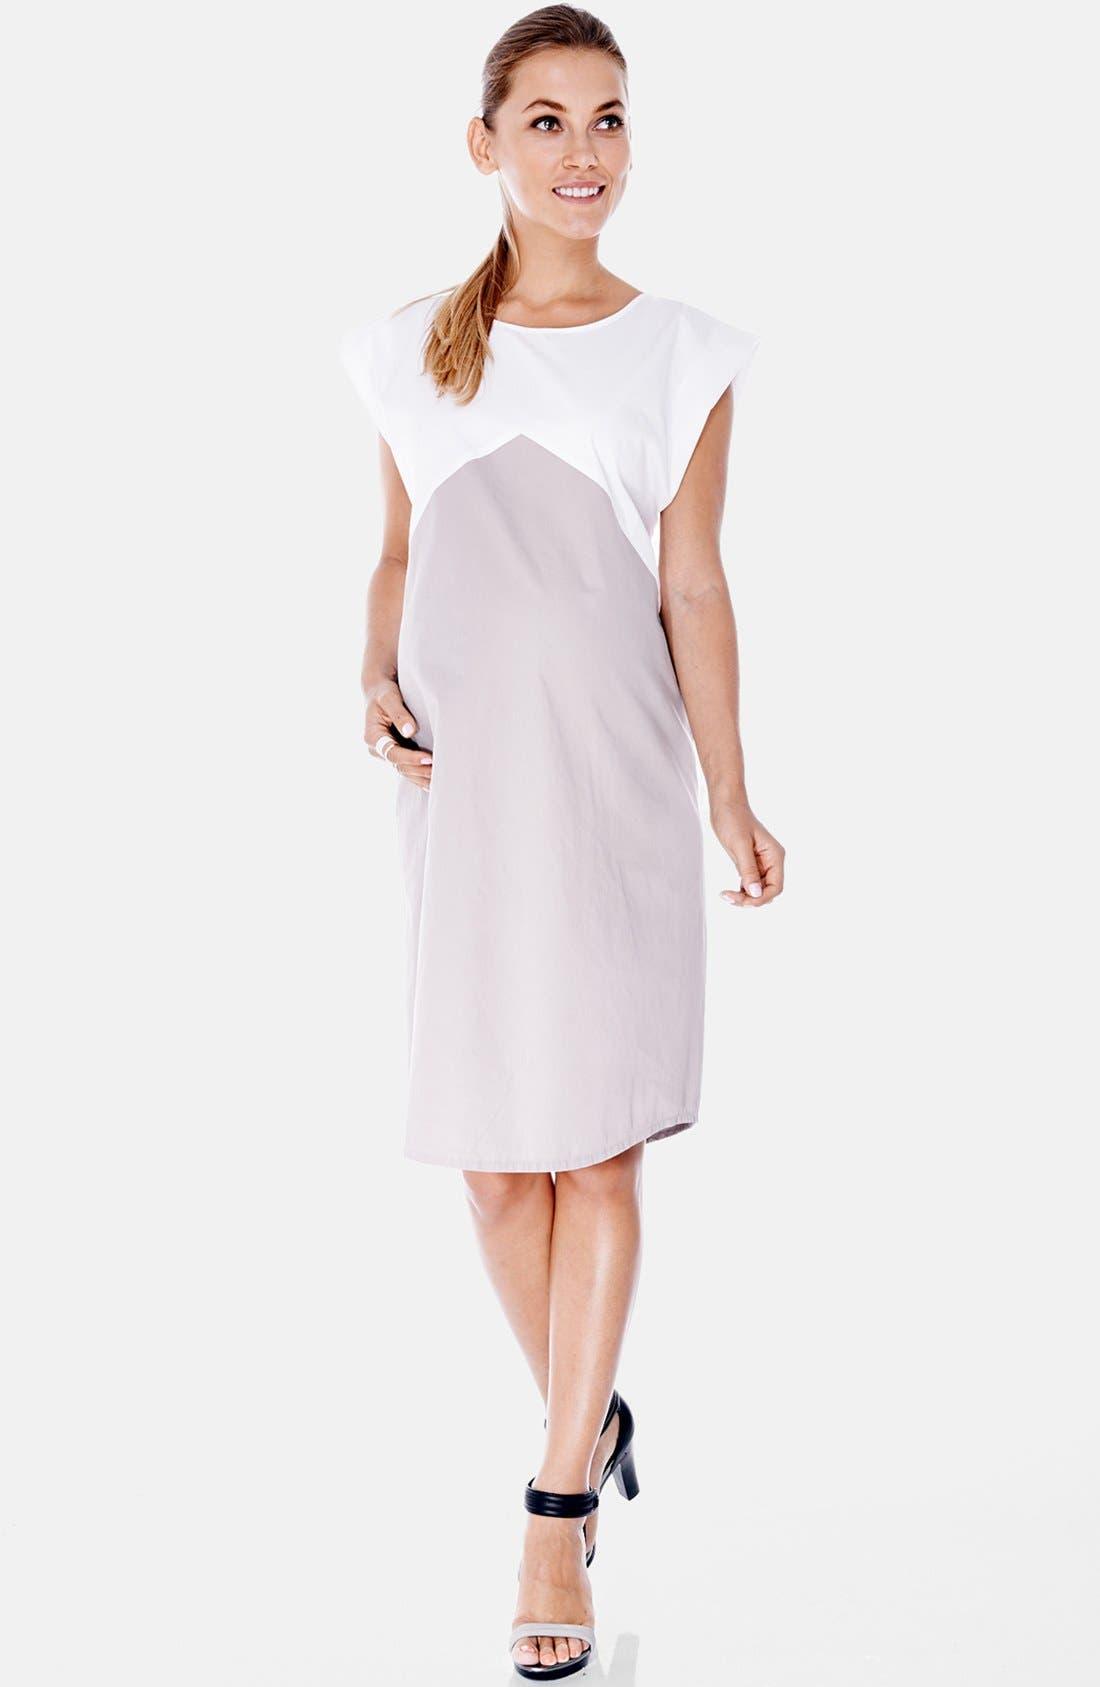 Alternate Image 1 Selected - Imanimo 'Kate' Maternity Dress